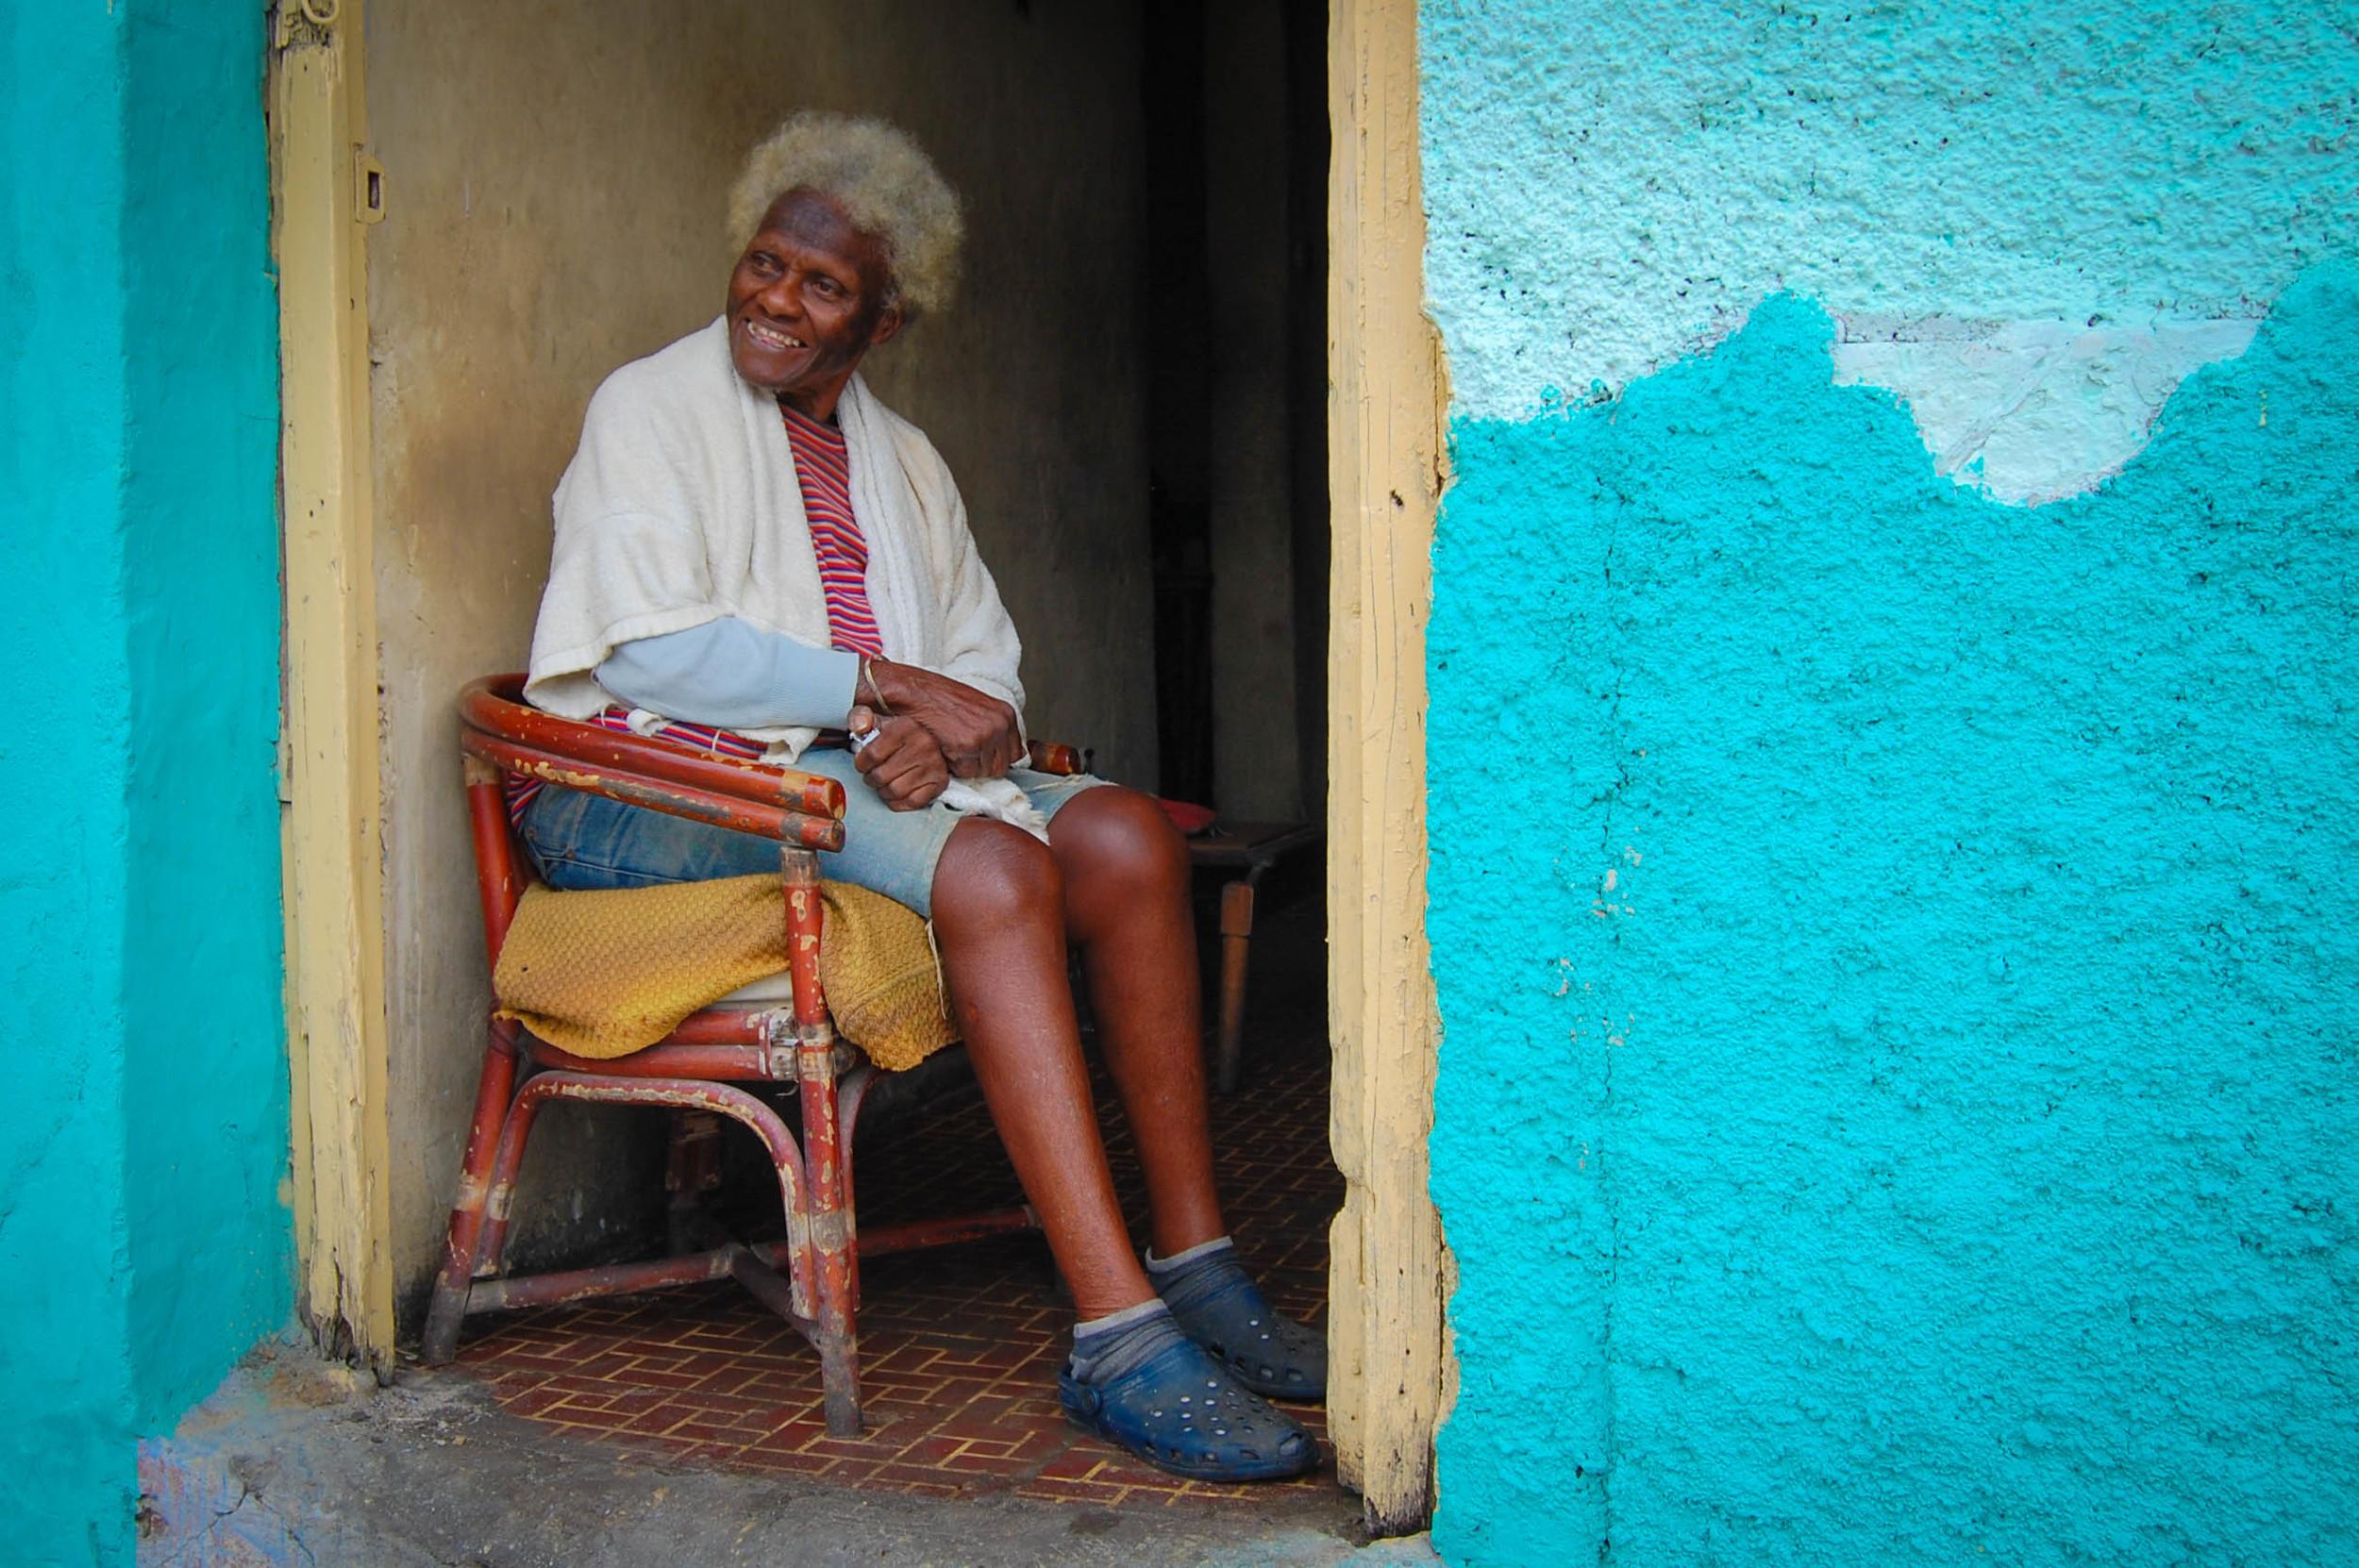 Woman in doorway Varadero, Cuba Nikon D40, 18-55 F3.5 3.13